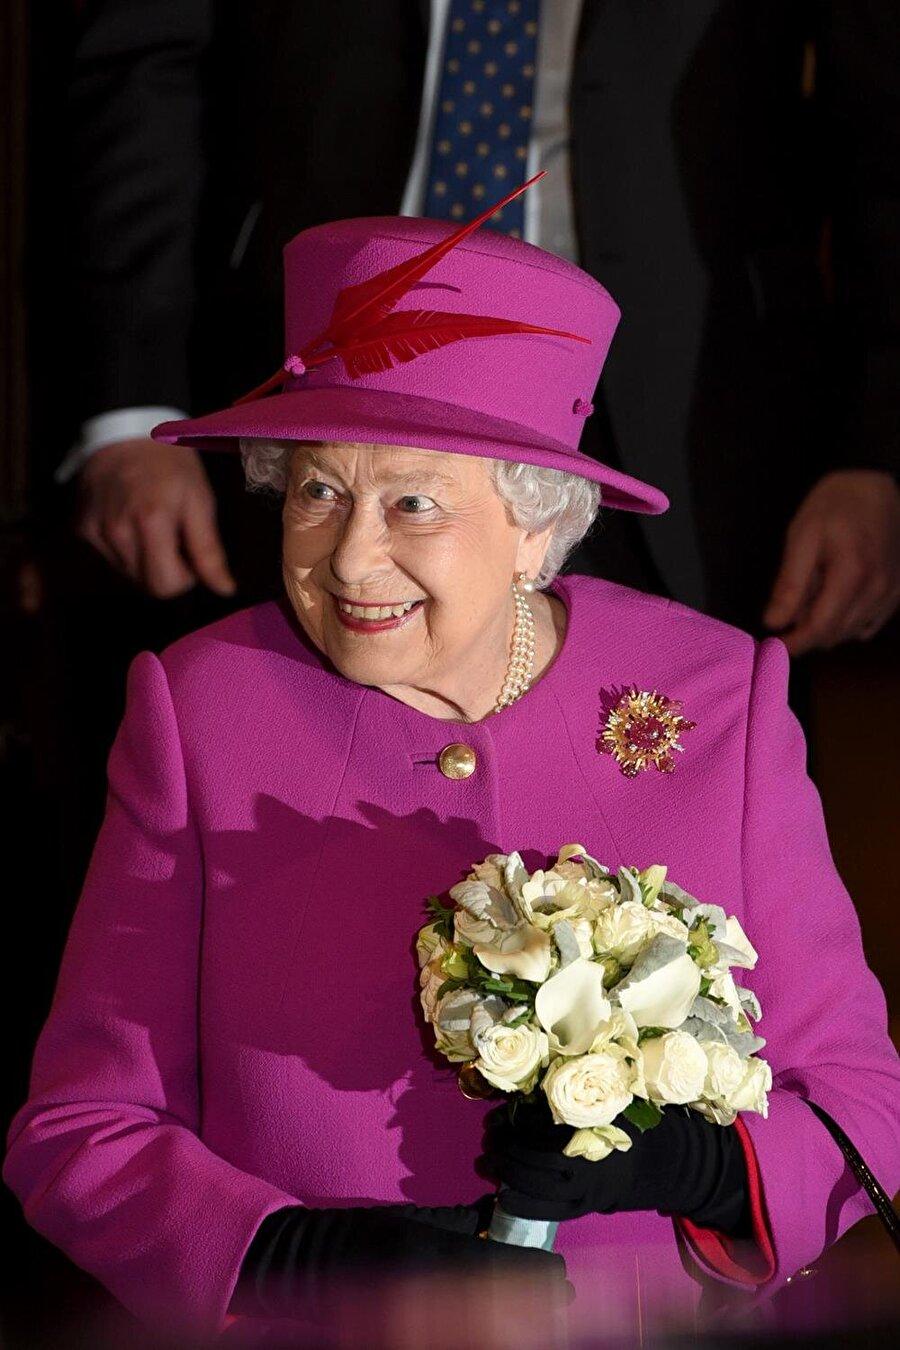 II. Elizabeth'in etkinliklere oğlu Prens Charles'ı göndermesi, 'Gölge Kral' benzetmesine neden oldu.